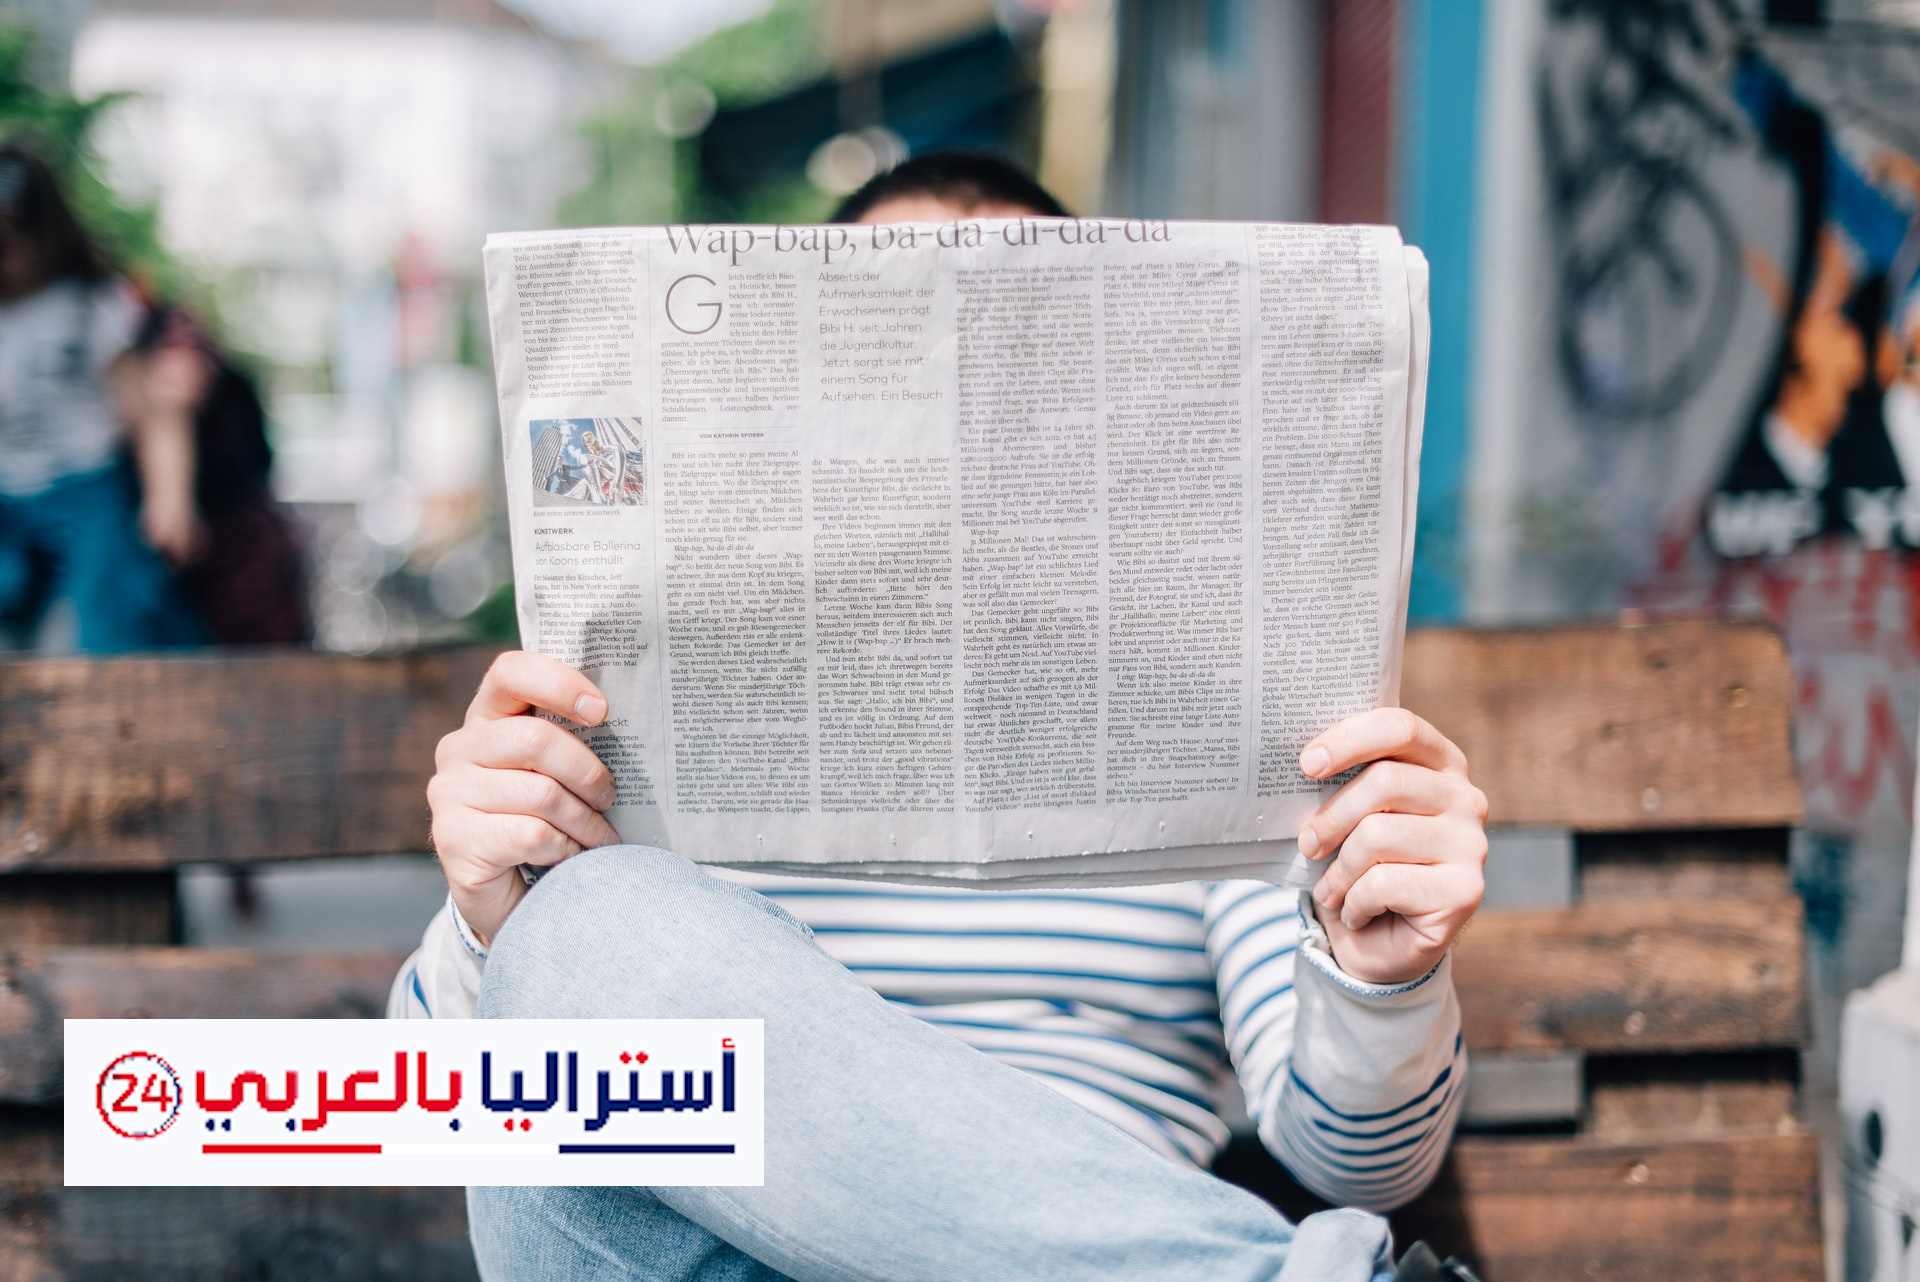 اخبار استراليا بالعربي